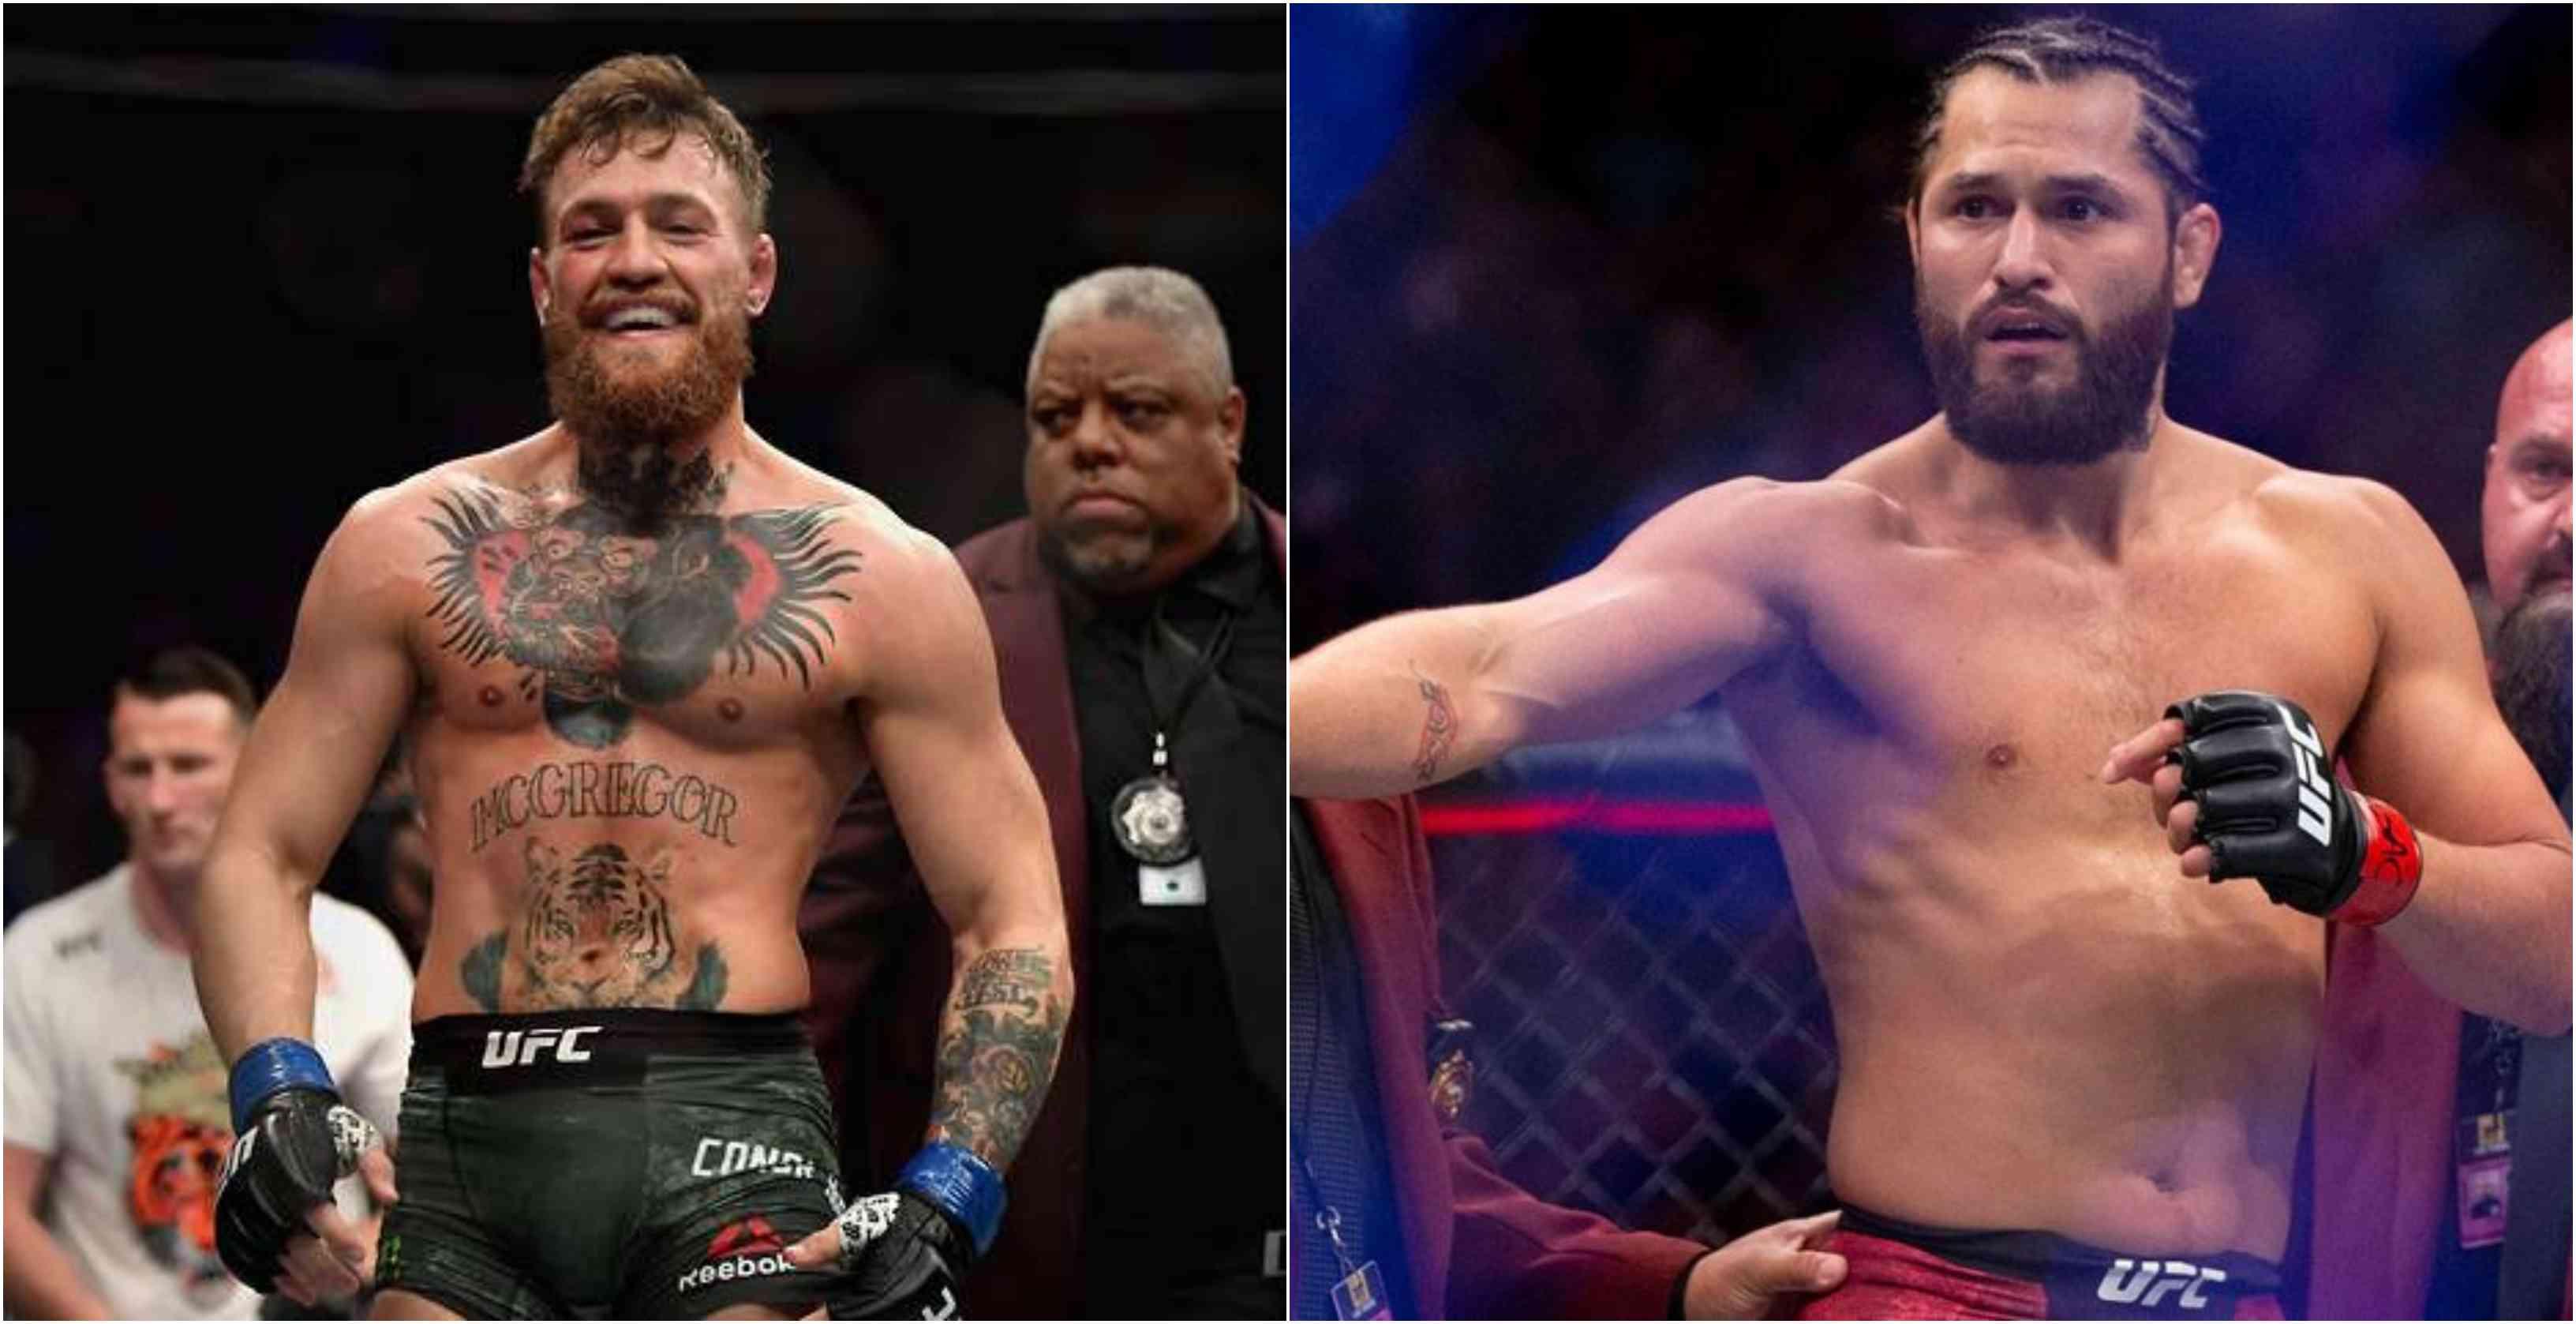 Jorge Masvidal wants to 'break Conor McGregor's face' next - Masvidal